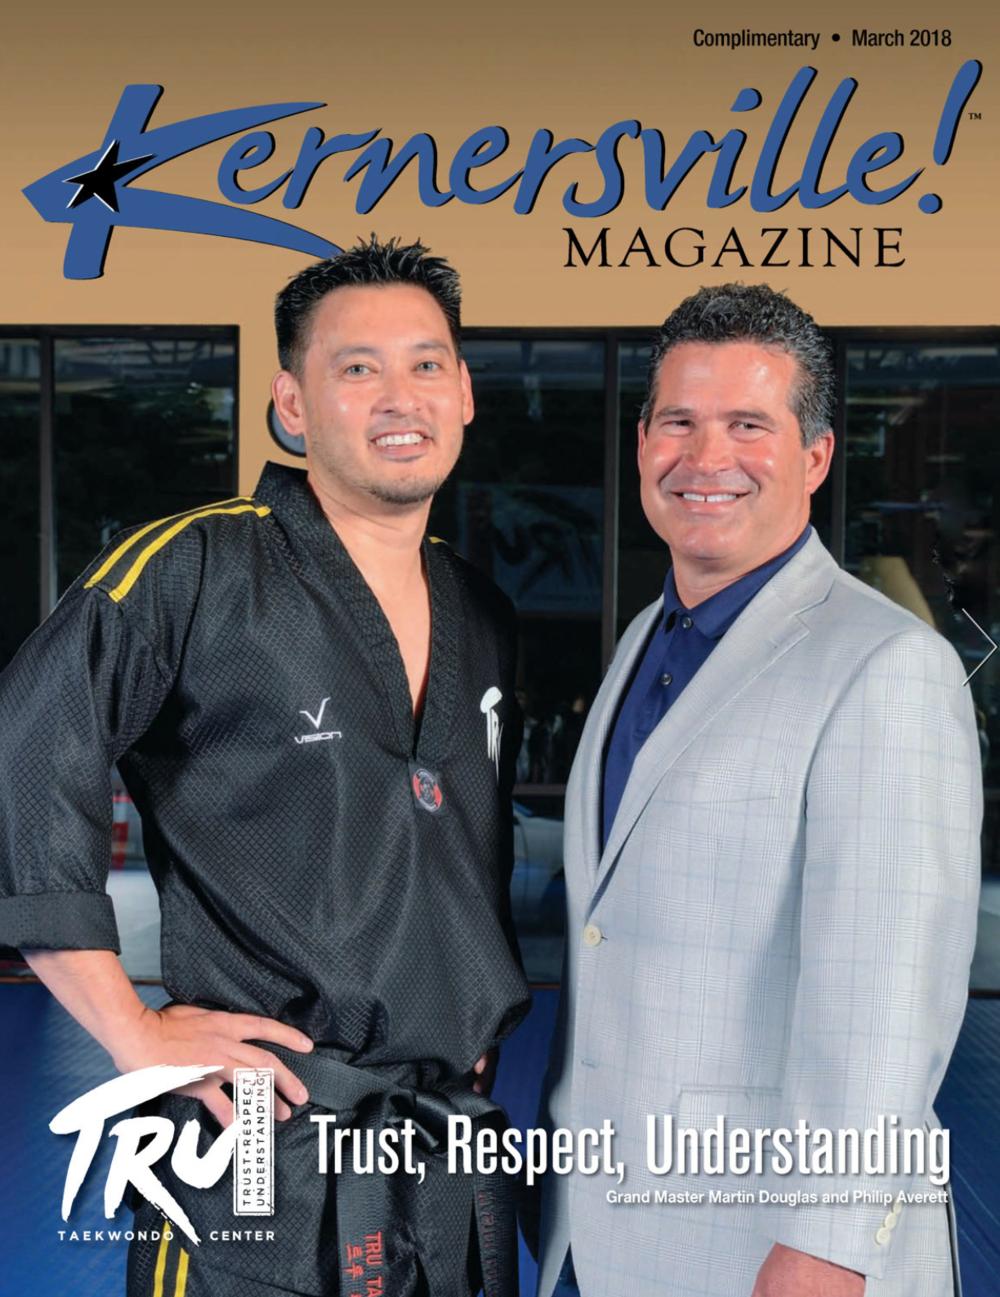 TRUST, RESPECT, UNDERSTANDING - Kernersville Magazine, March 2018Written by: Bruce Frankel